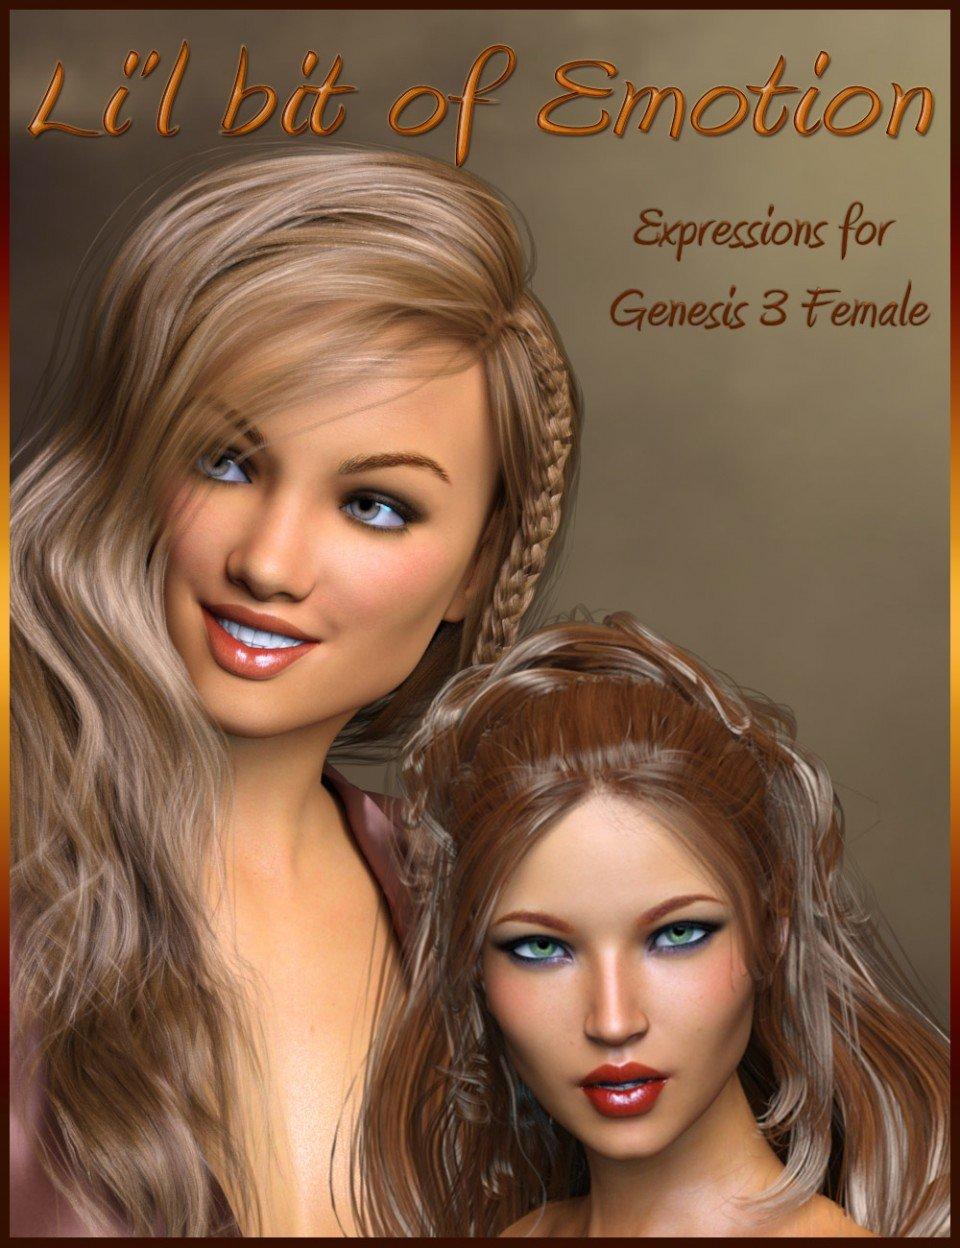 Li'l bit of Emotion for Genesis 3 Female_DAZ3D下载站